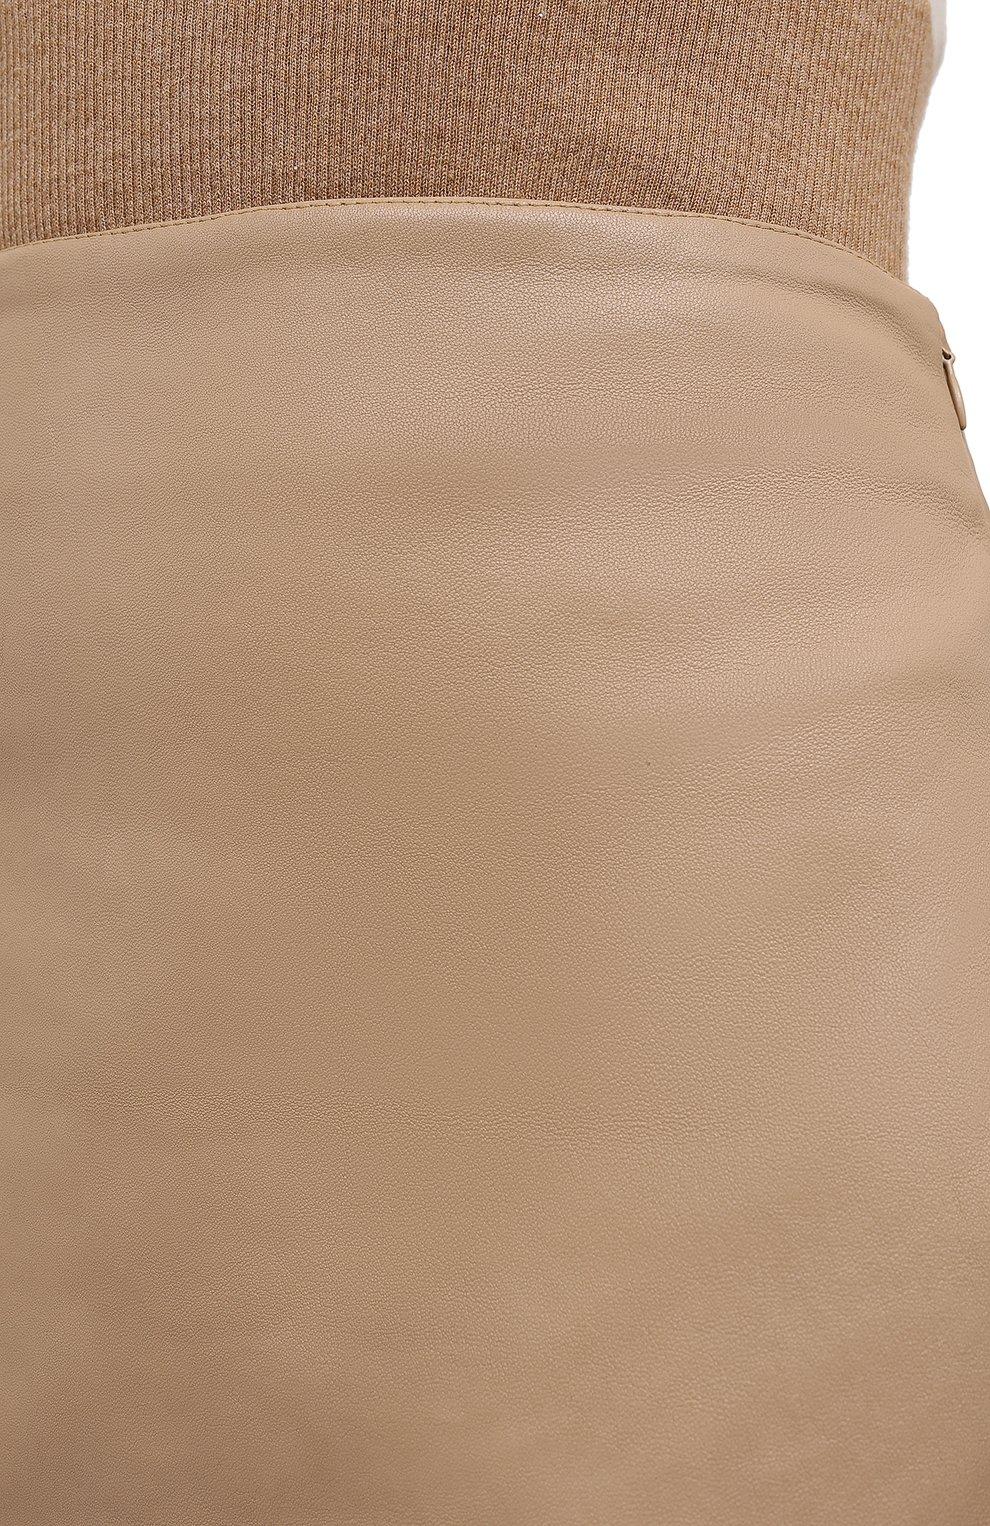 Женская кожаная юбка KITON бежевого цвета, арт. D50271X05S03 | Фото 6